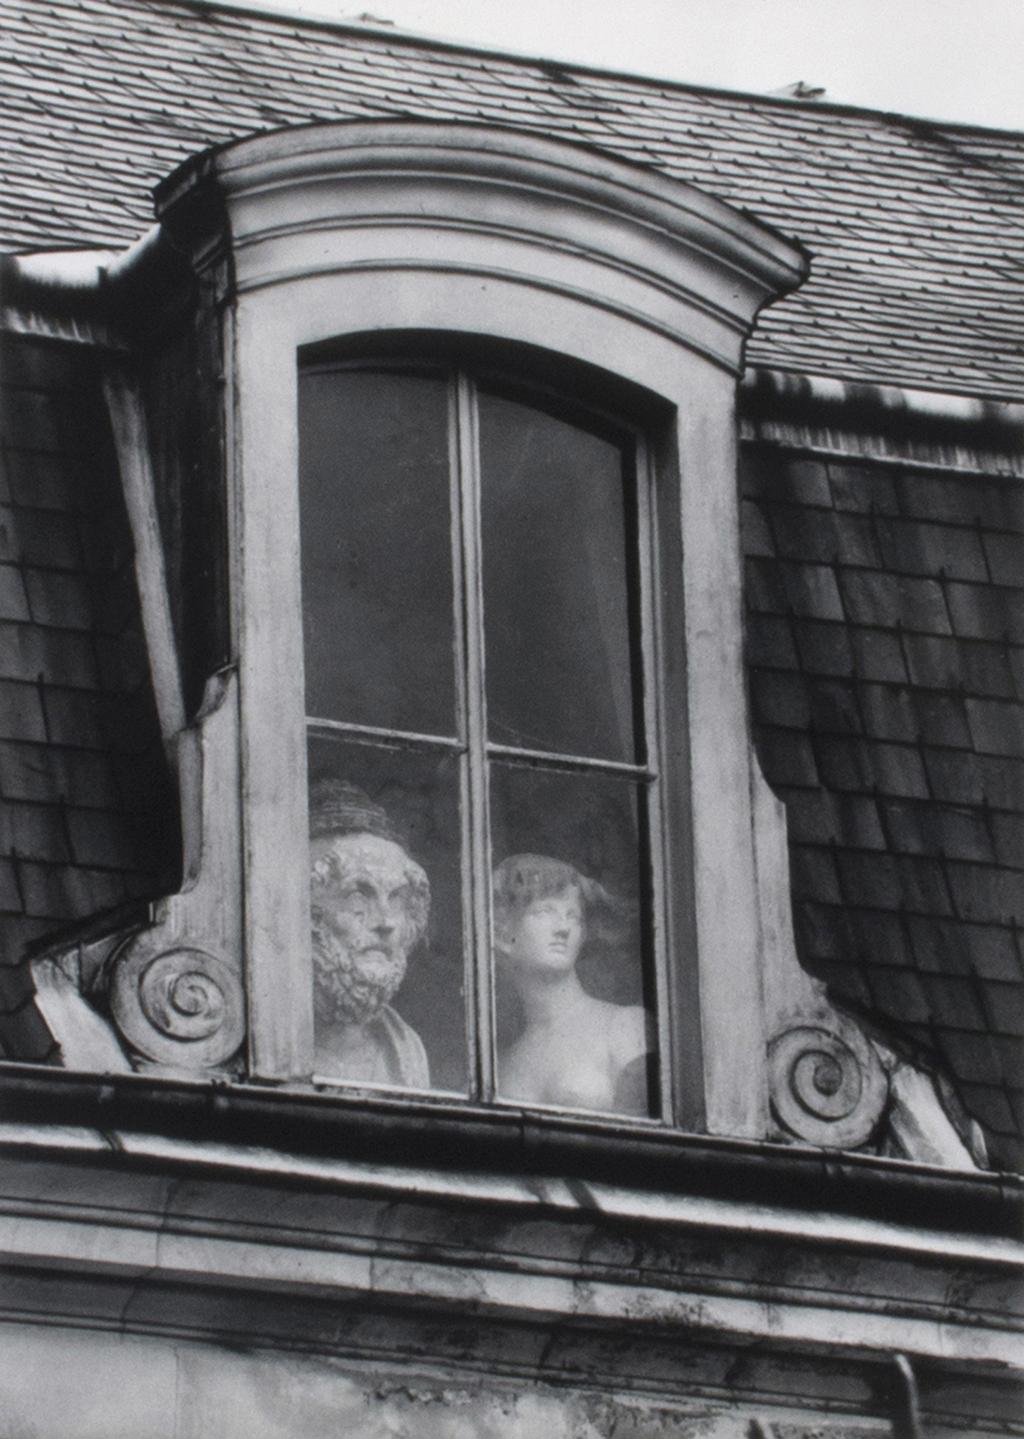 La finestra di fronte una mostra di andr kert sz internazionale - Una finestra di fronte ...